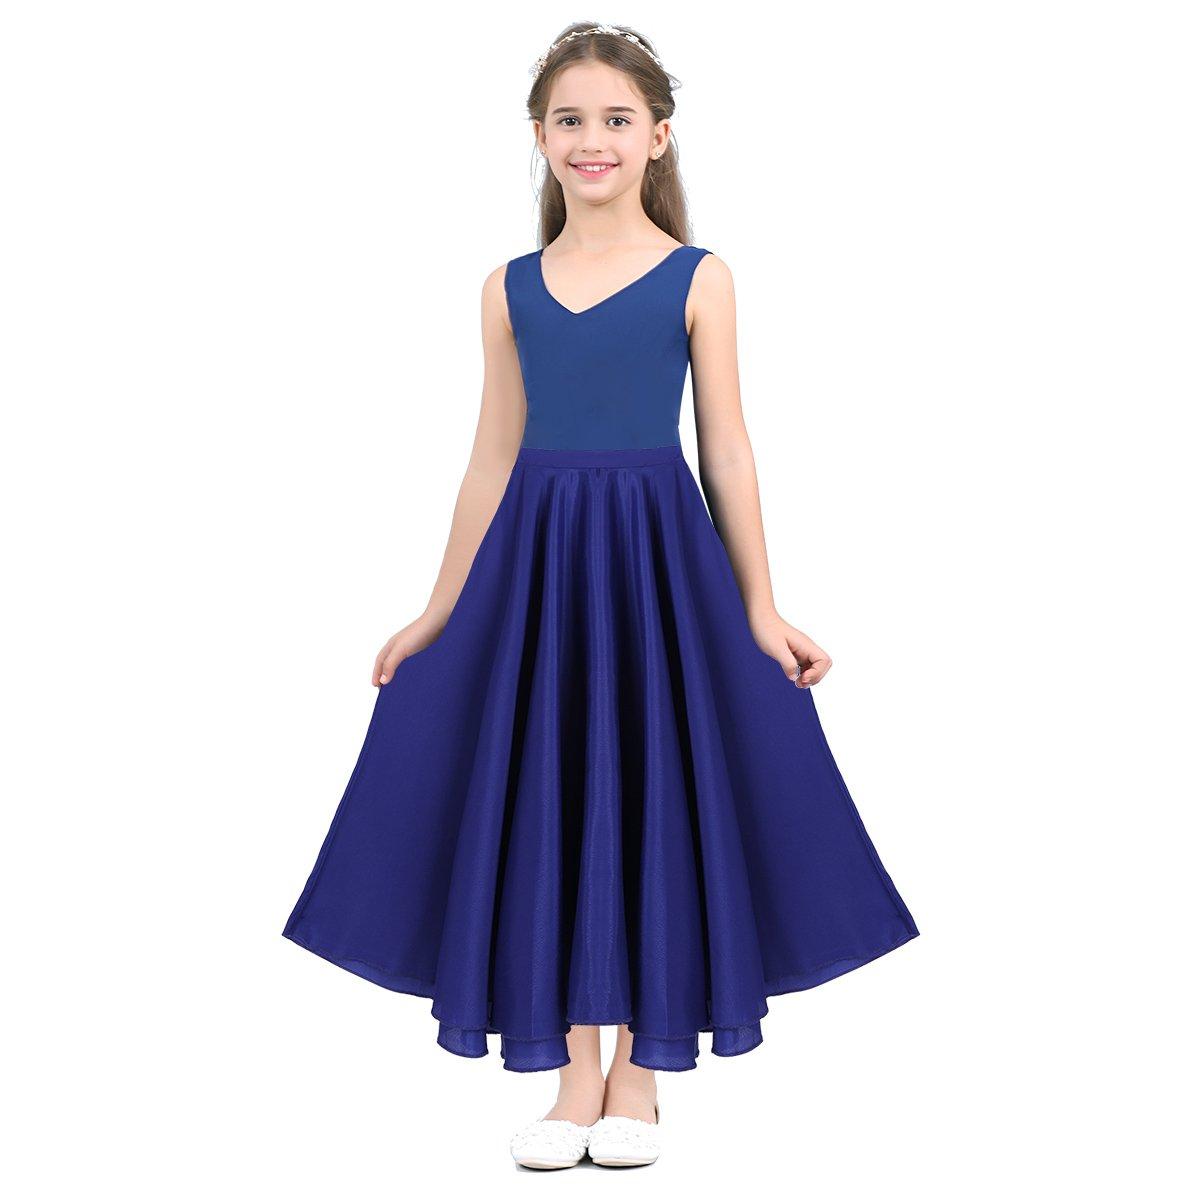 IEFIEL Larga Falda de Danza Nina Infantil Disfraz de Baile Flamenco sevillanas Tango Vals Bailarina para Ni/ñas Chicas 6-14 A/ños